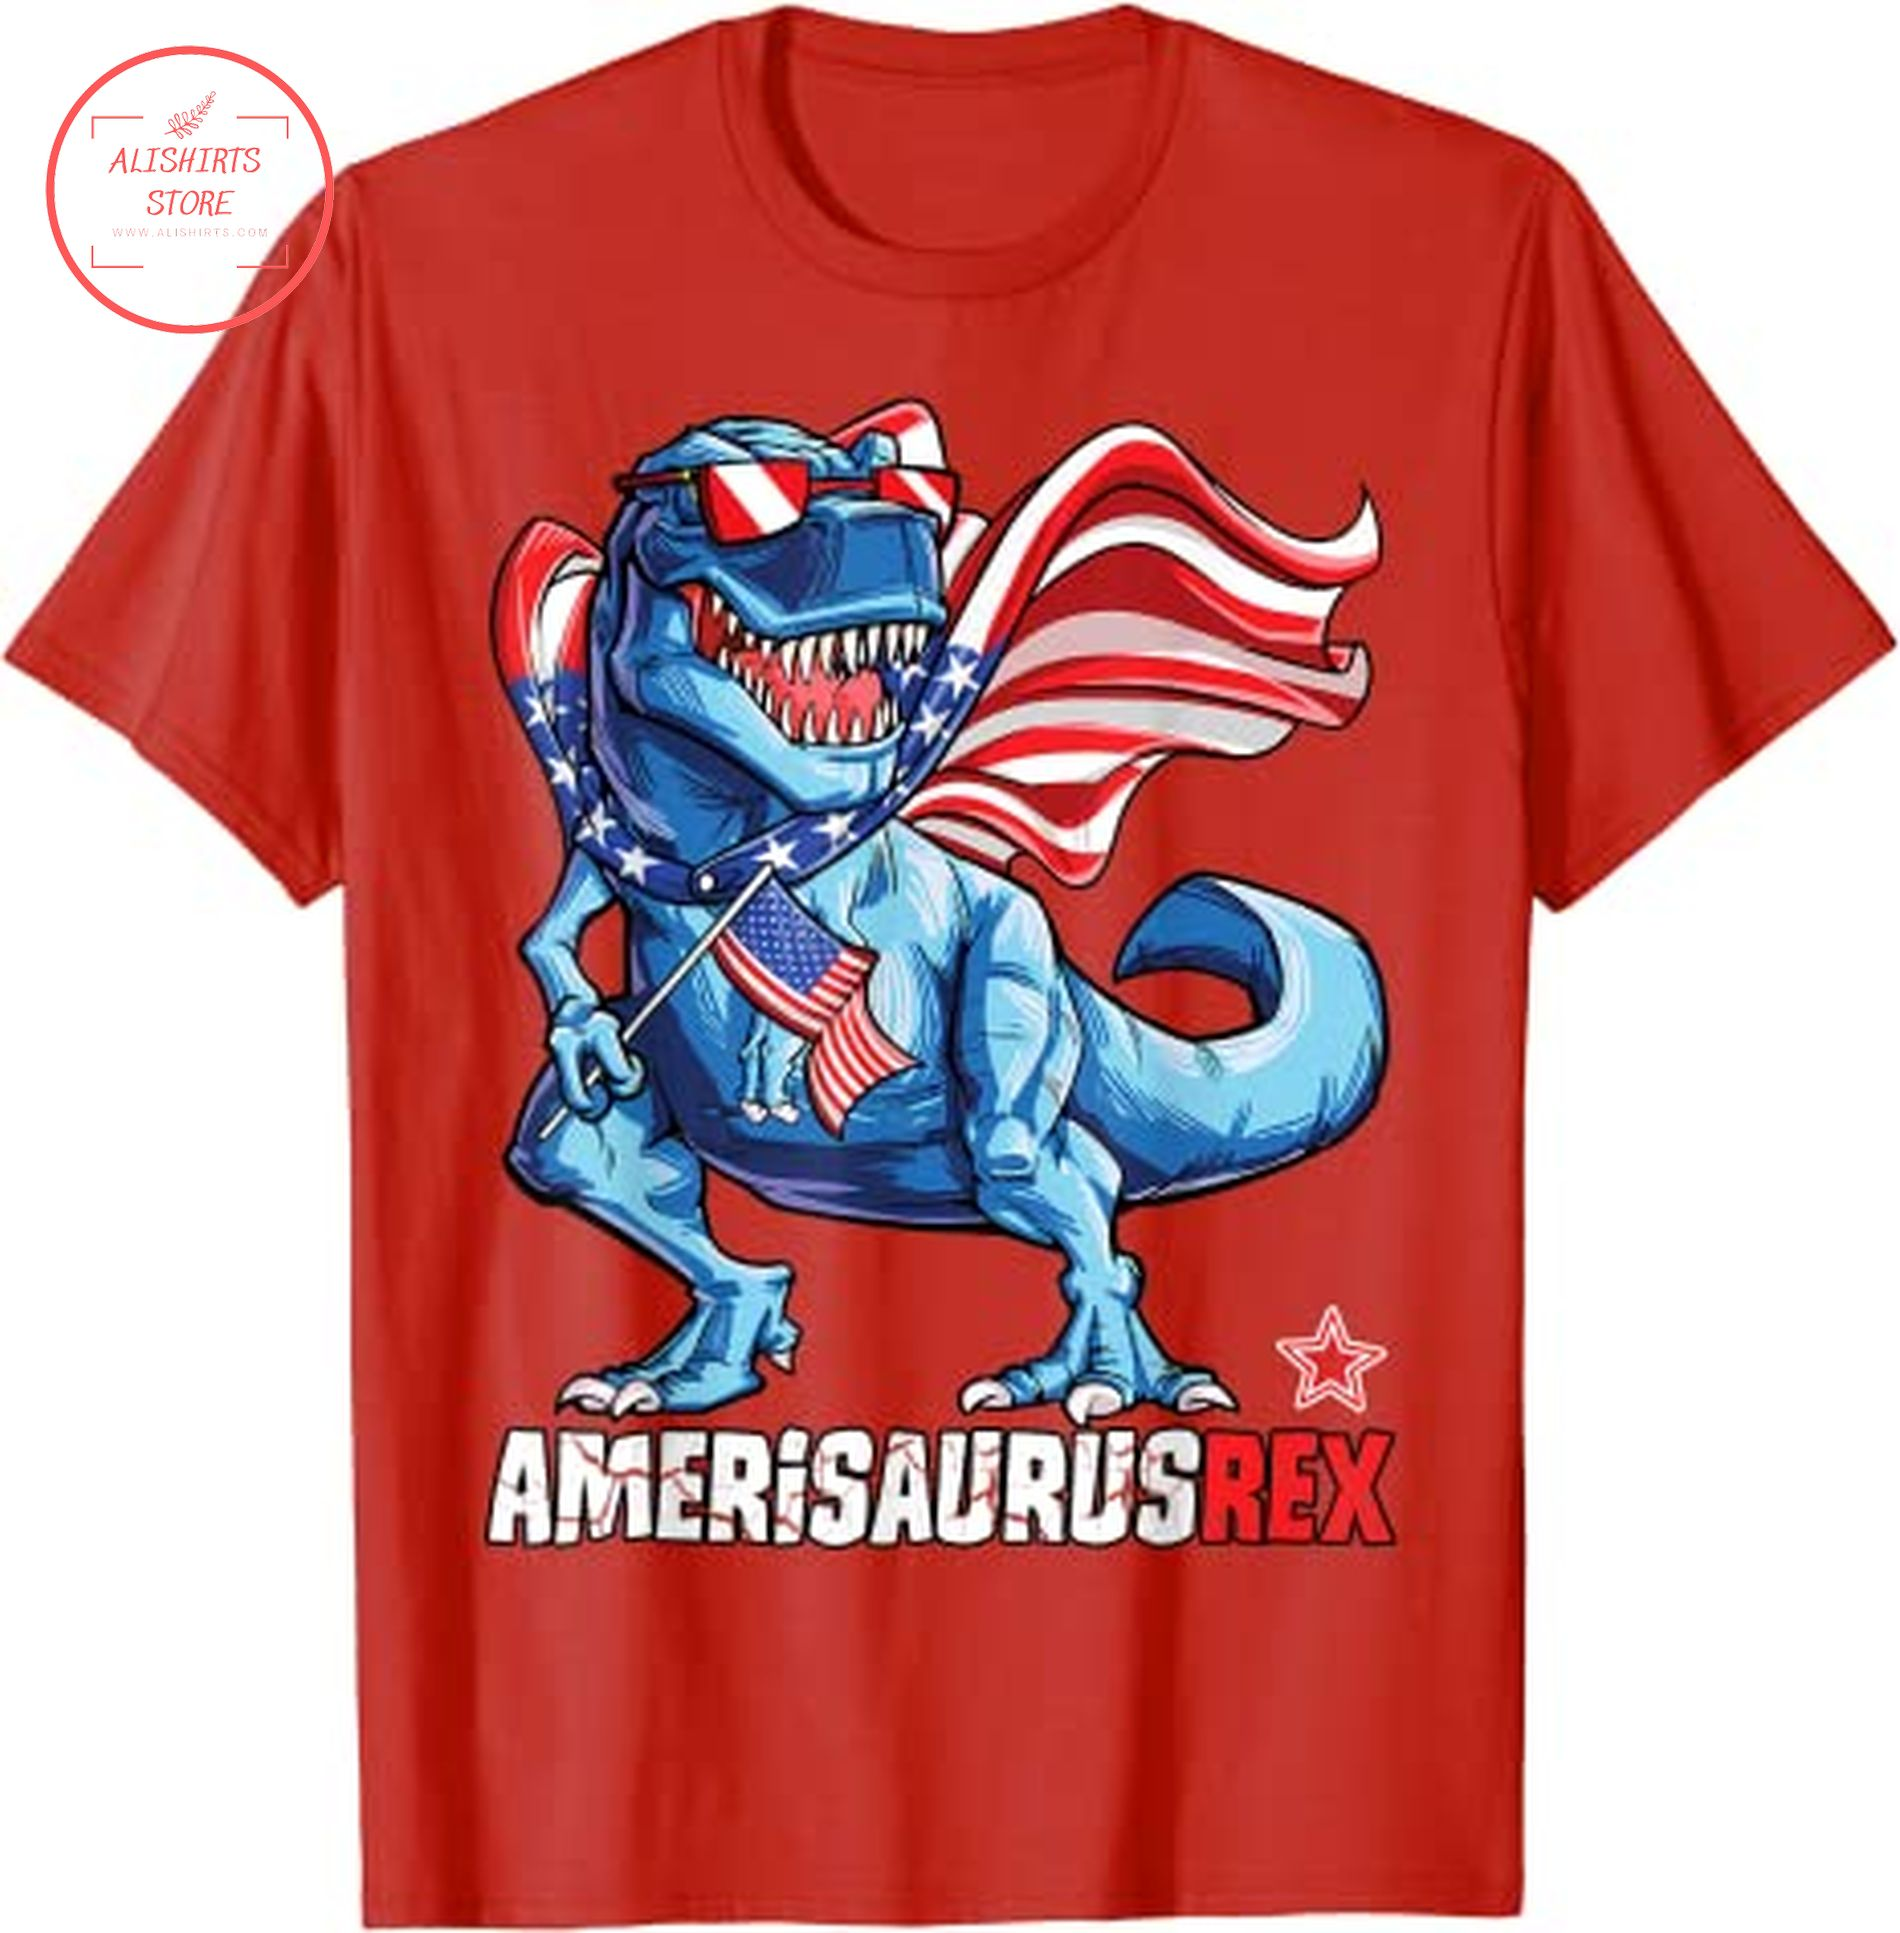 4th of July T rex shirt